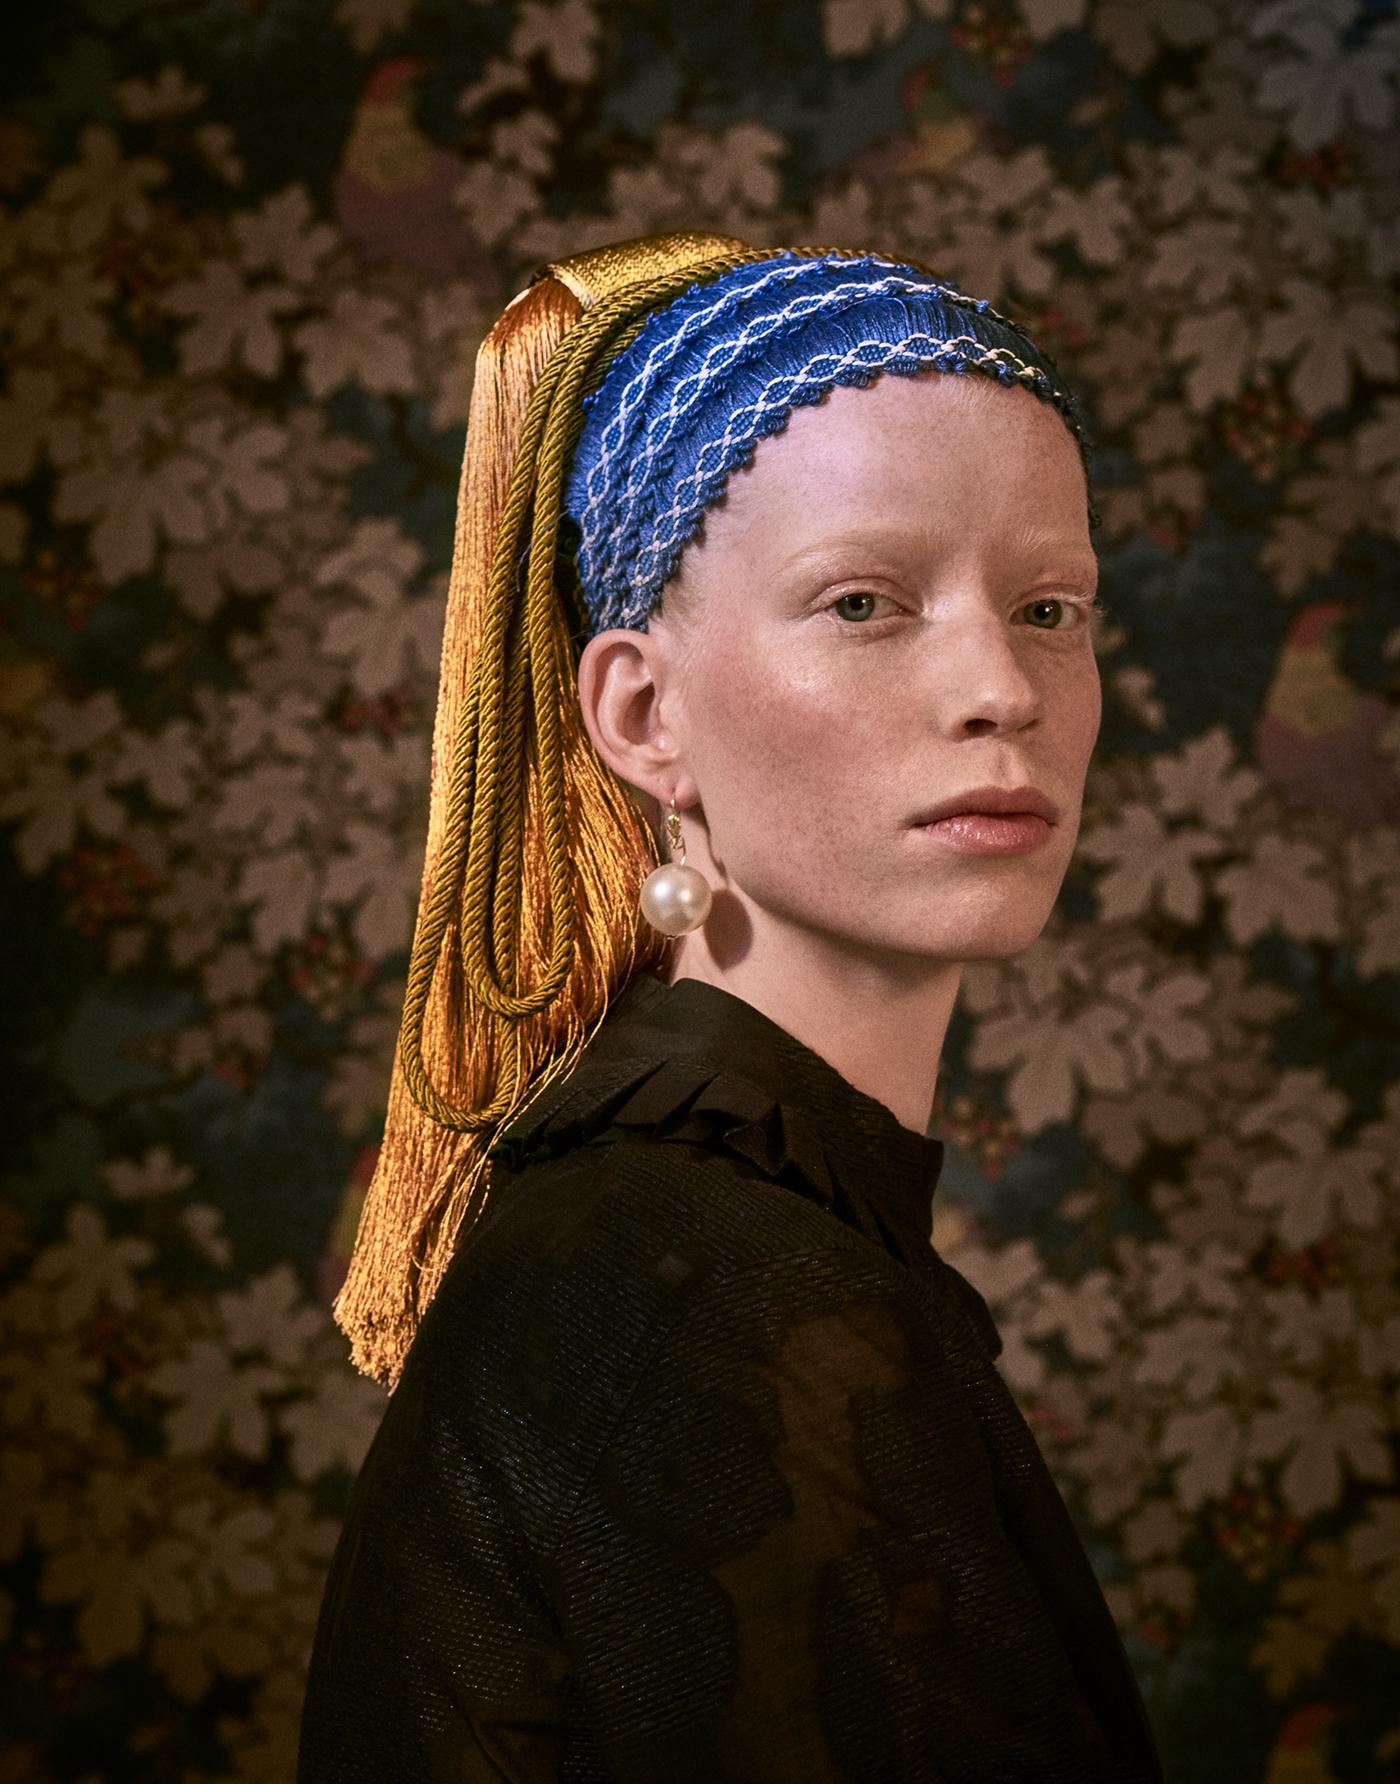 Lotte // Textilwirtschaft, photography by Eizaveta Porodina